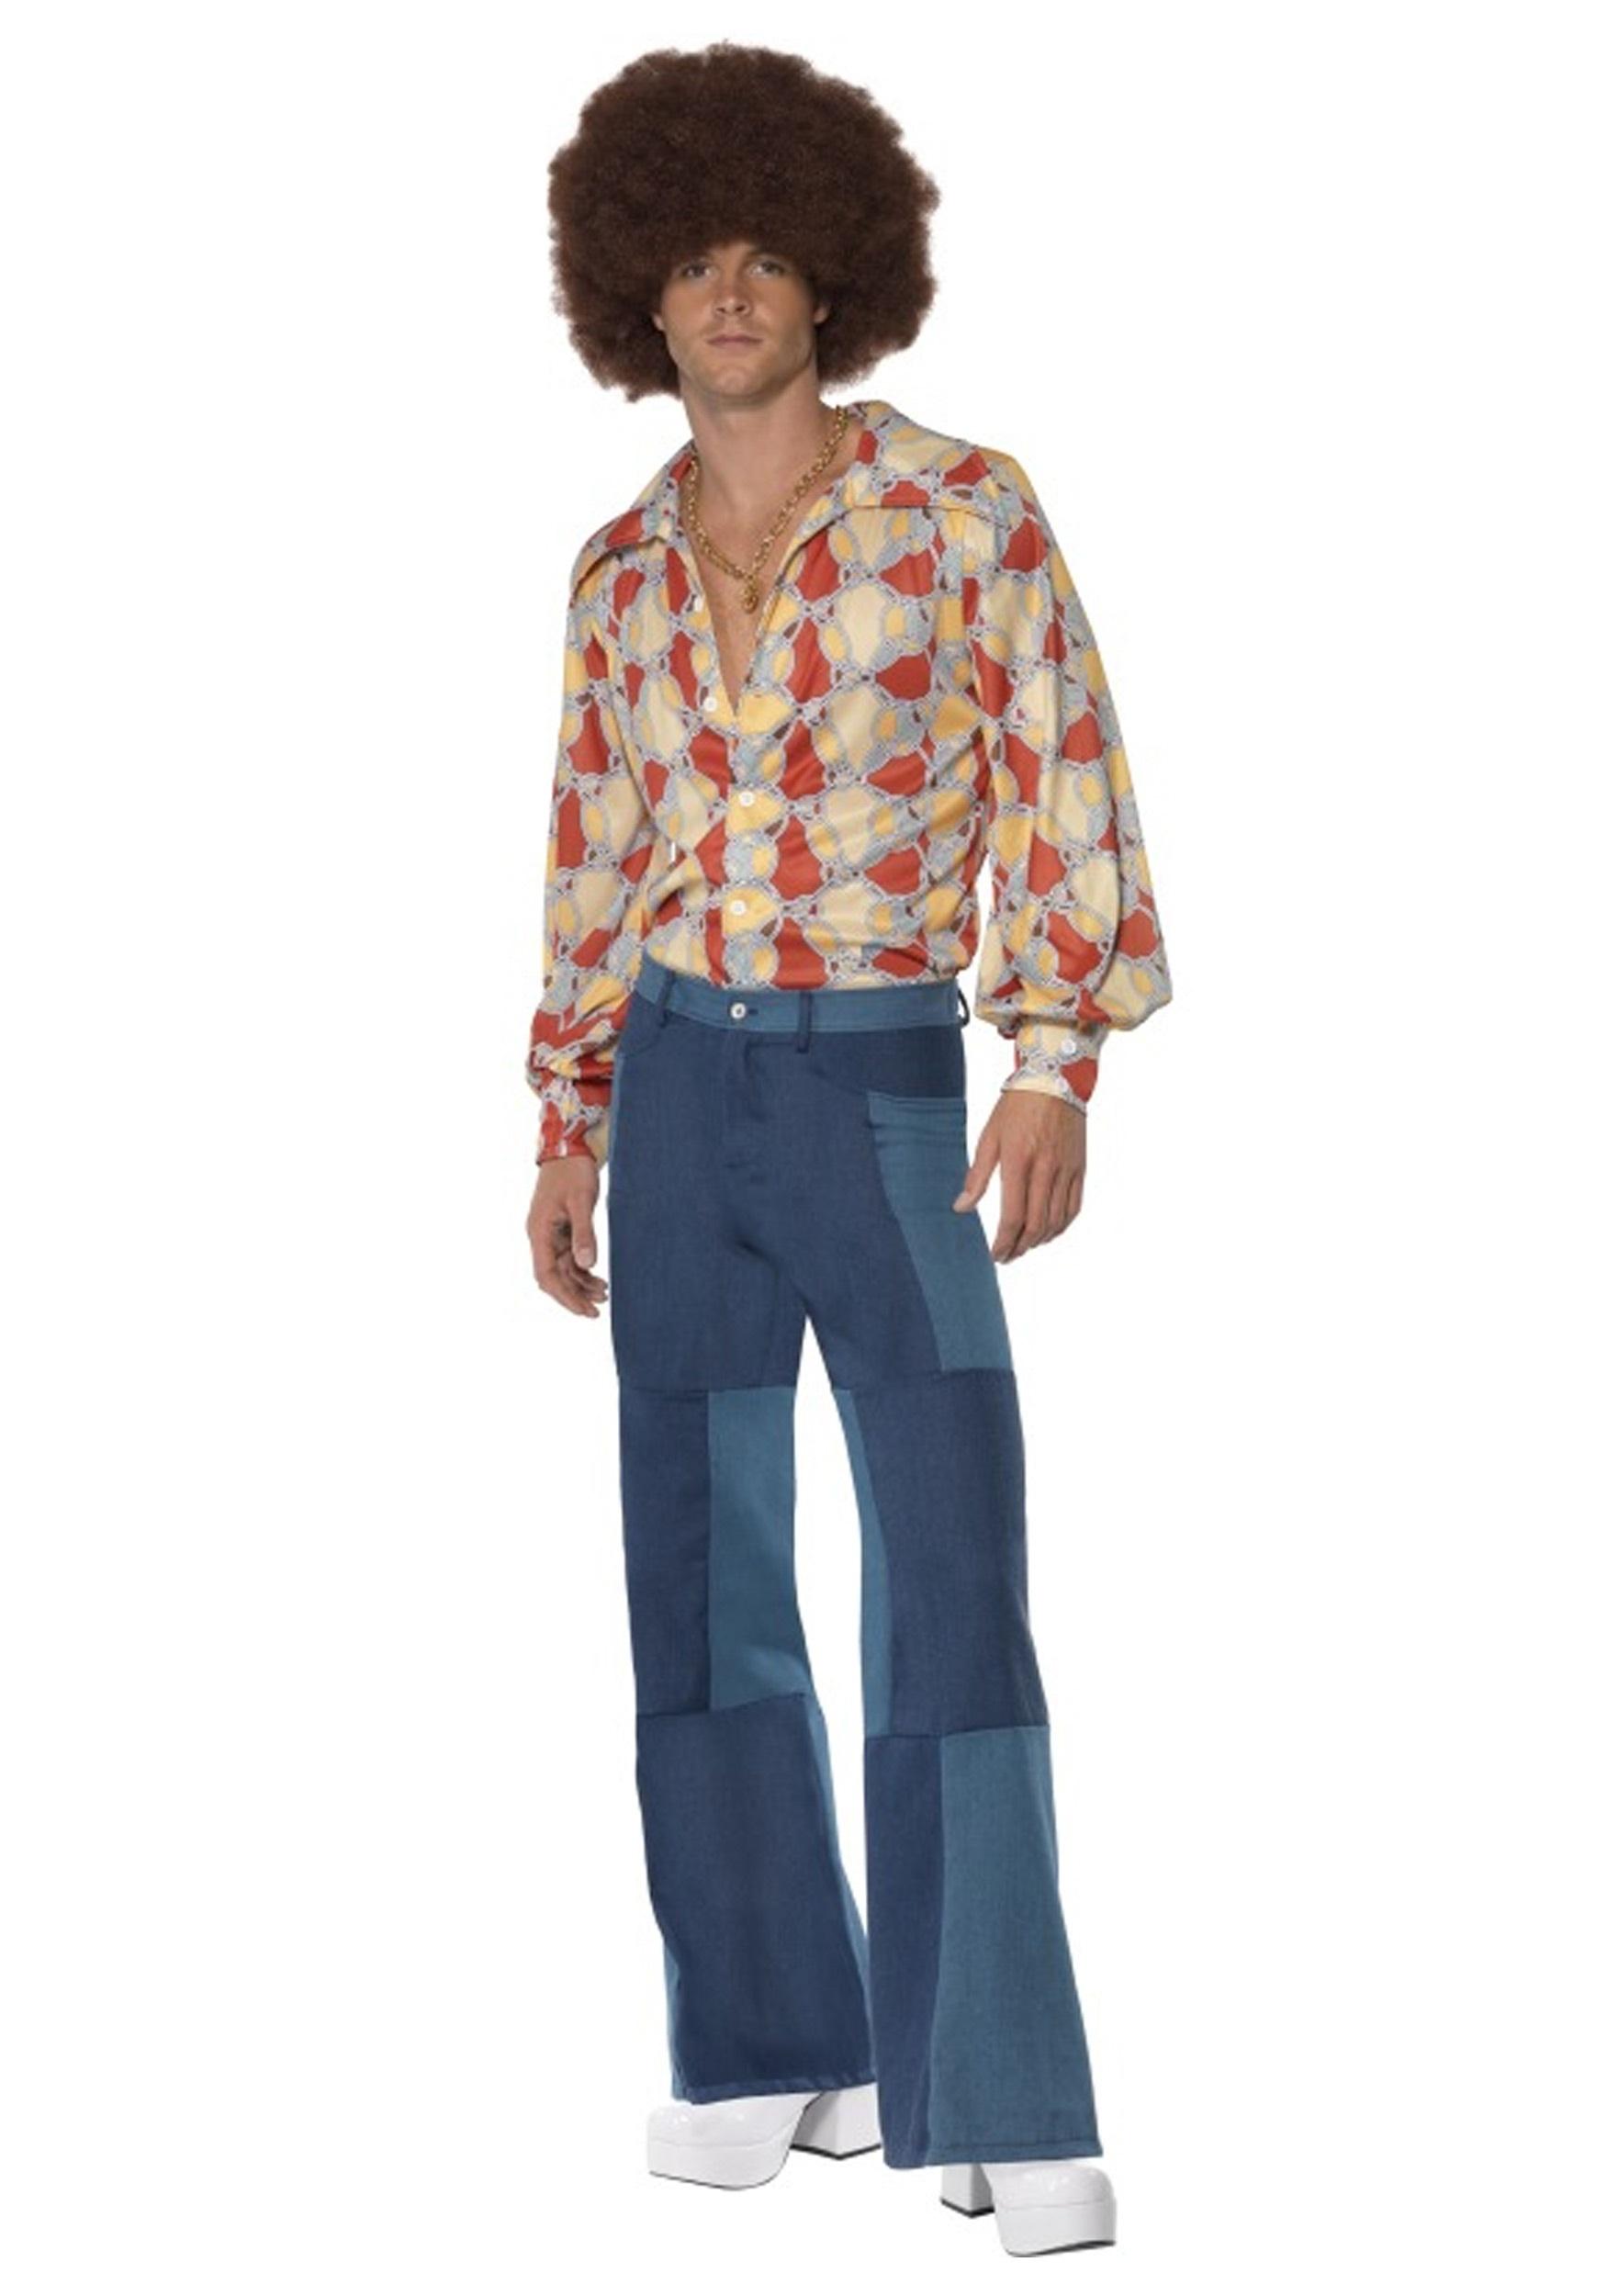 Patchwork Pants Men's Costume